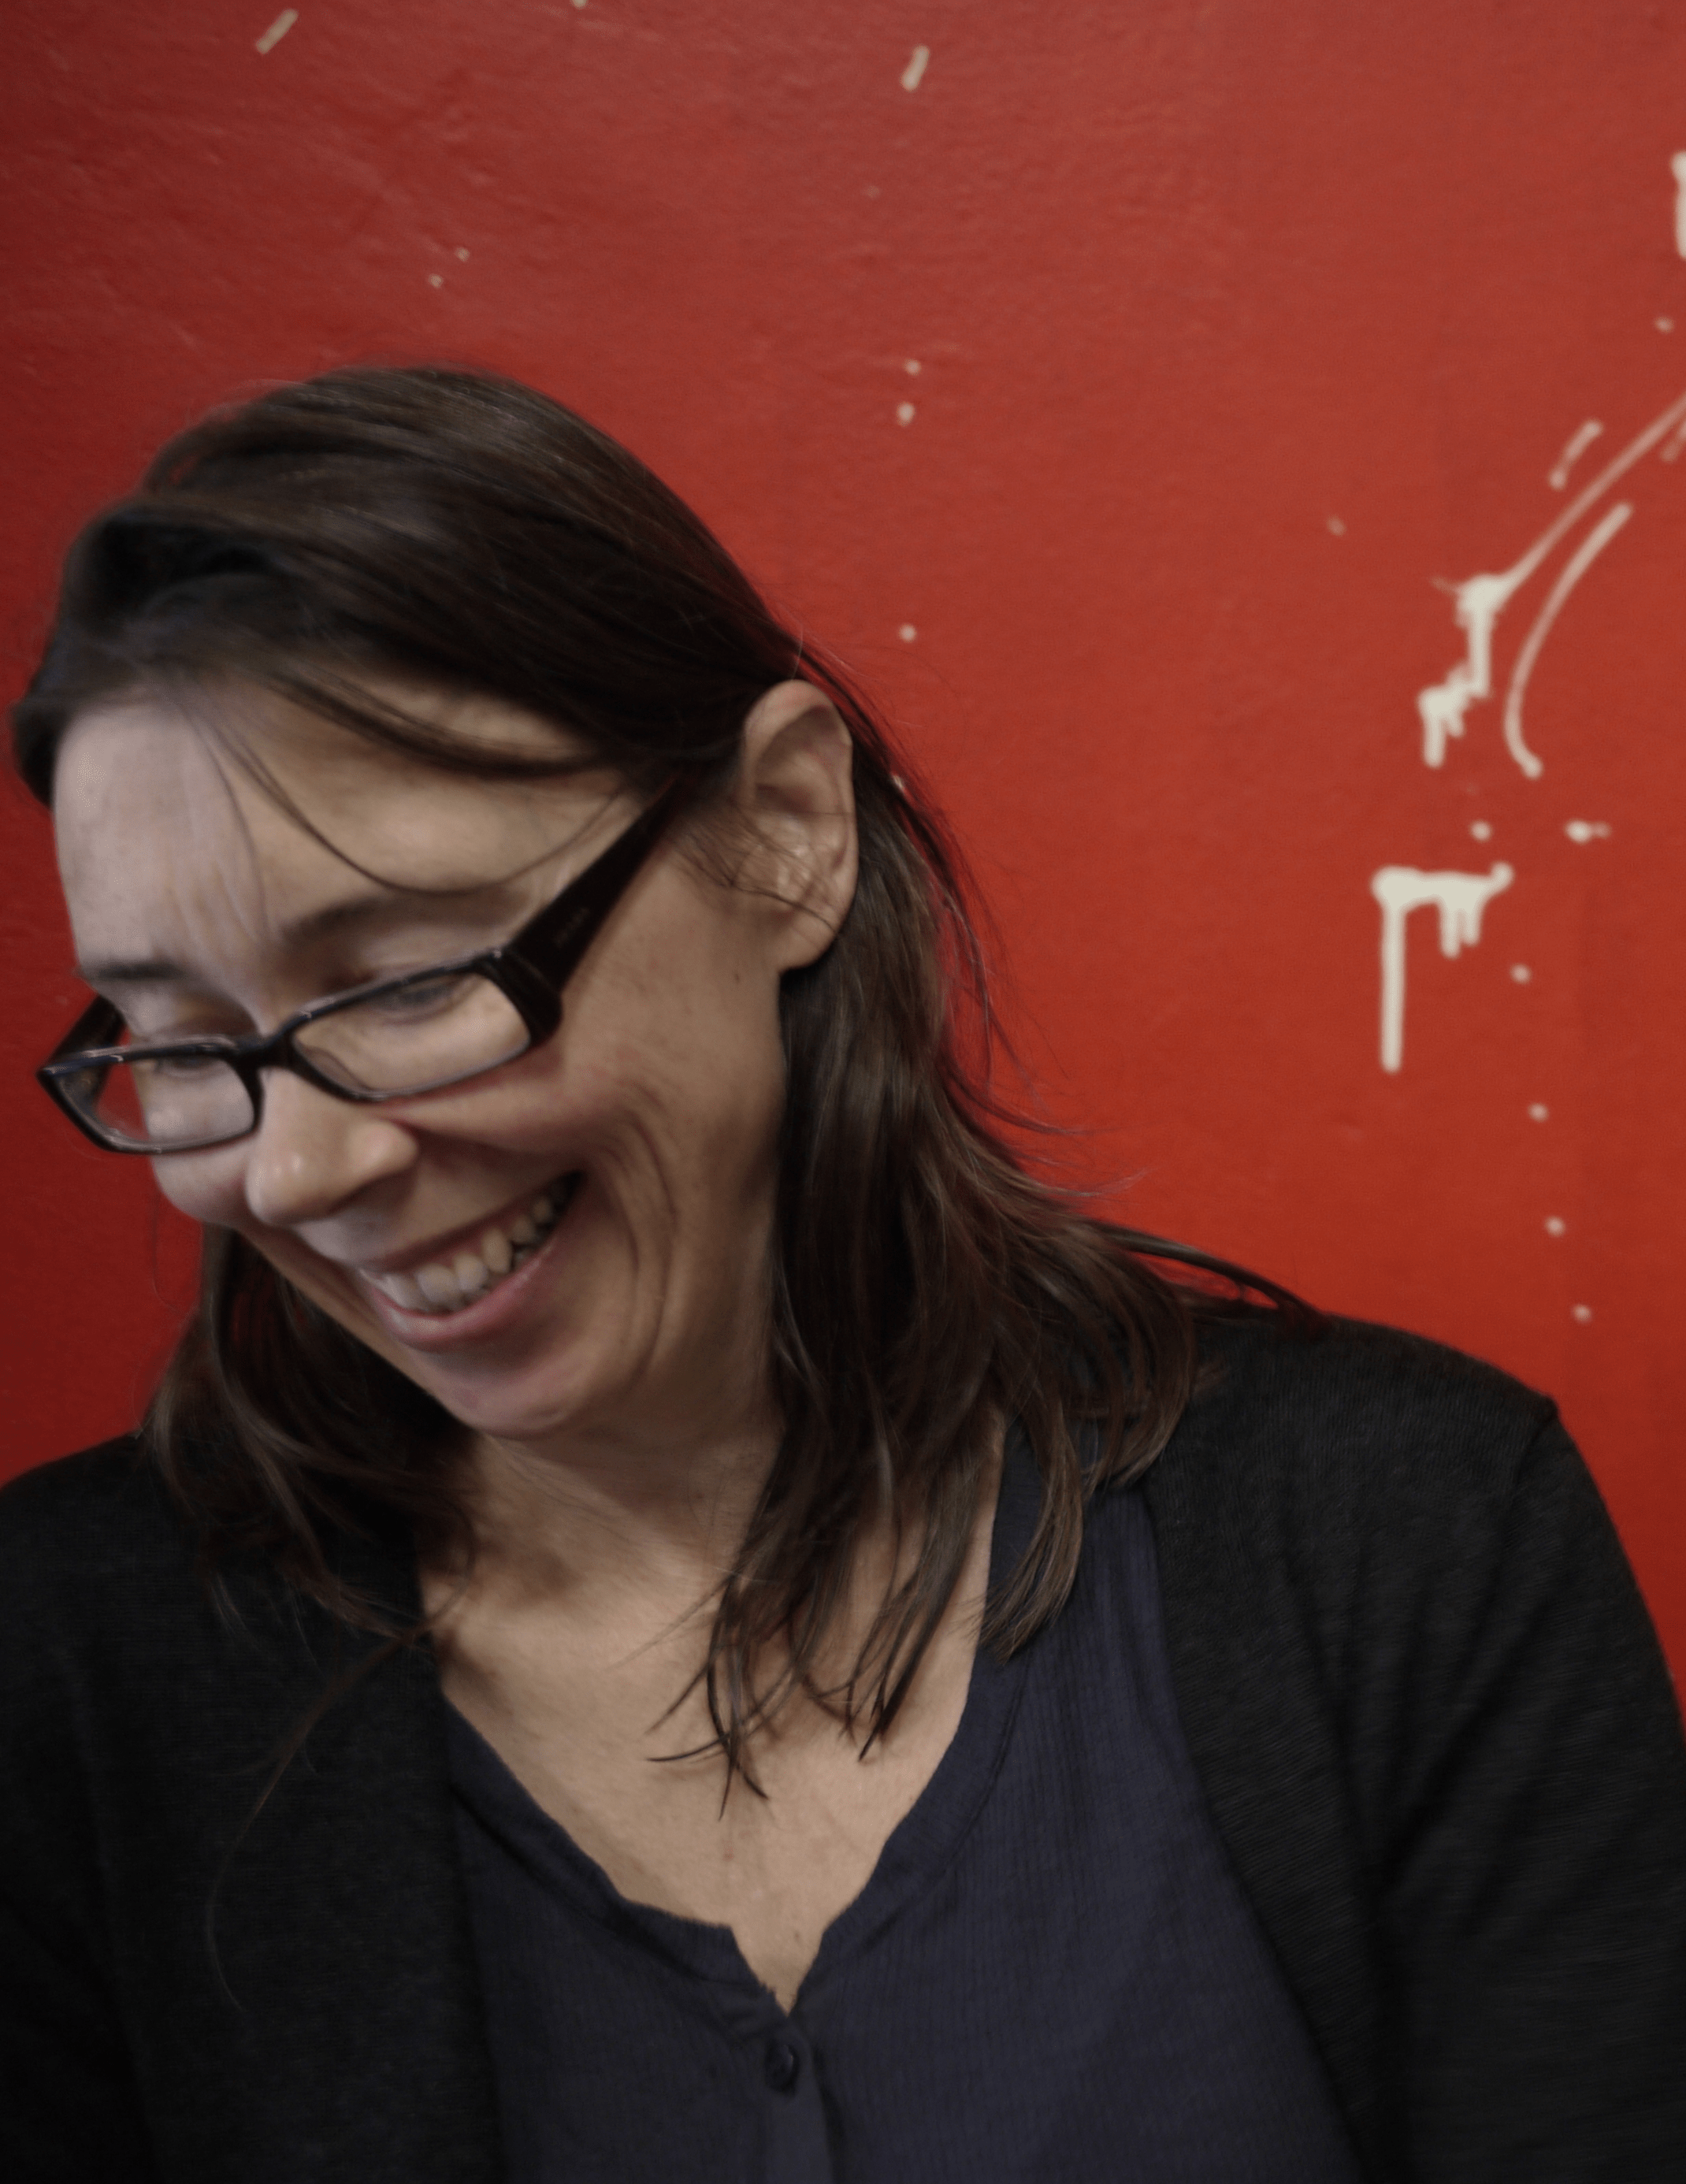 Associate Professor Sigi Antonia Jottkandt